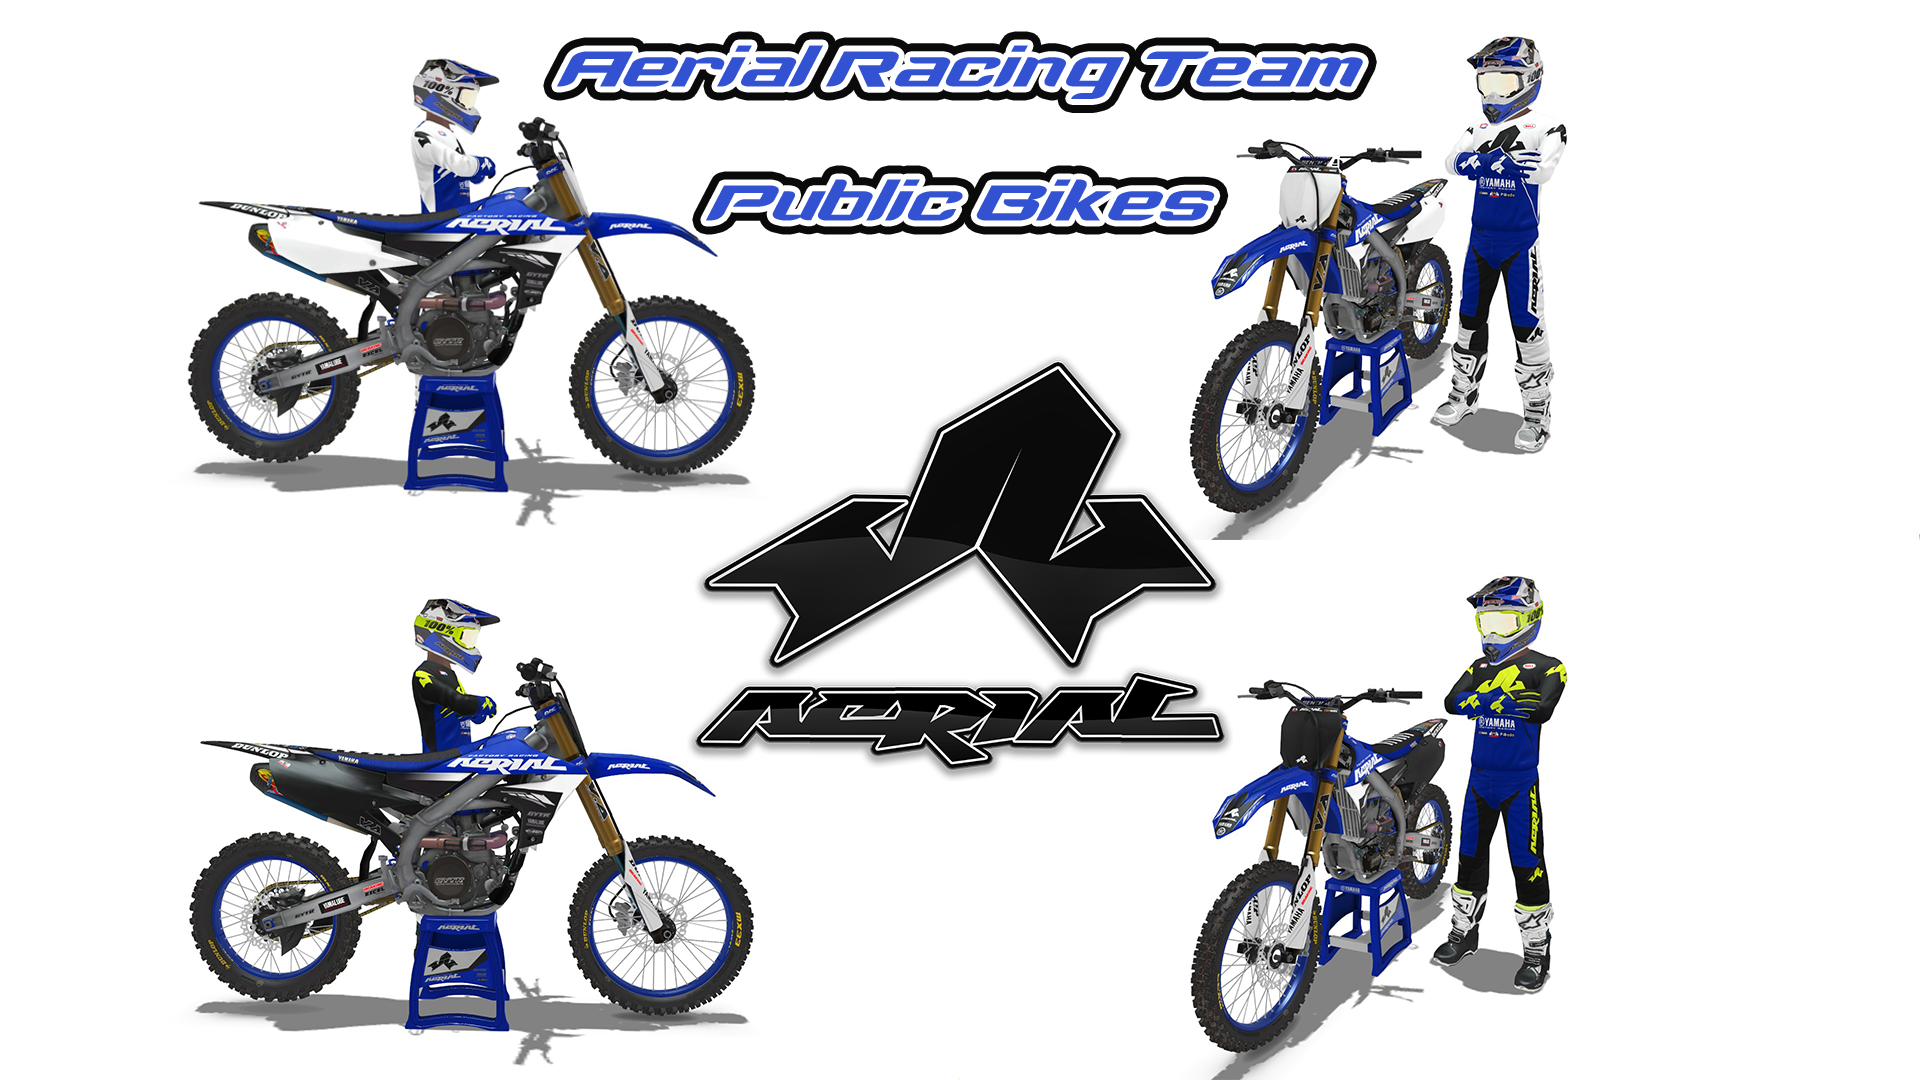 2021 Aerial Yamaha Racing Team PUBLIC BIKES